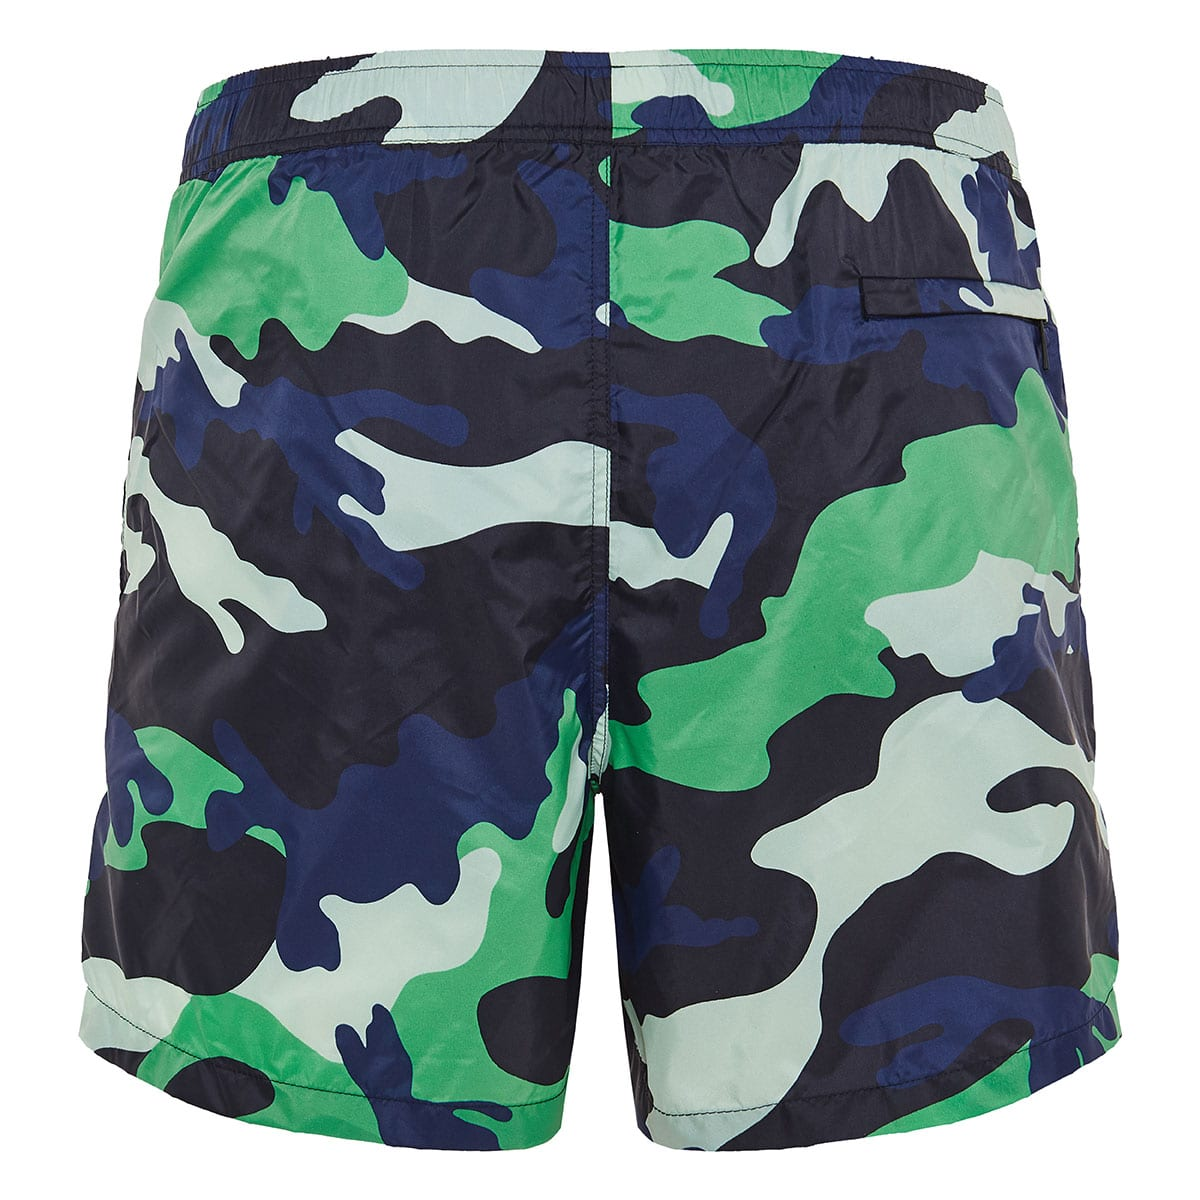 Camouflage printed swim shorts